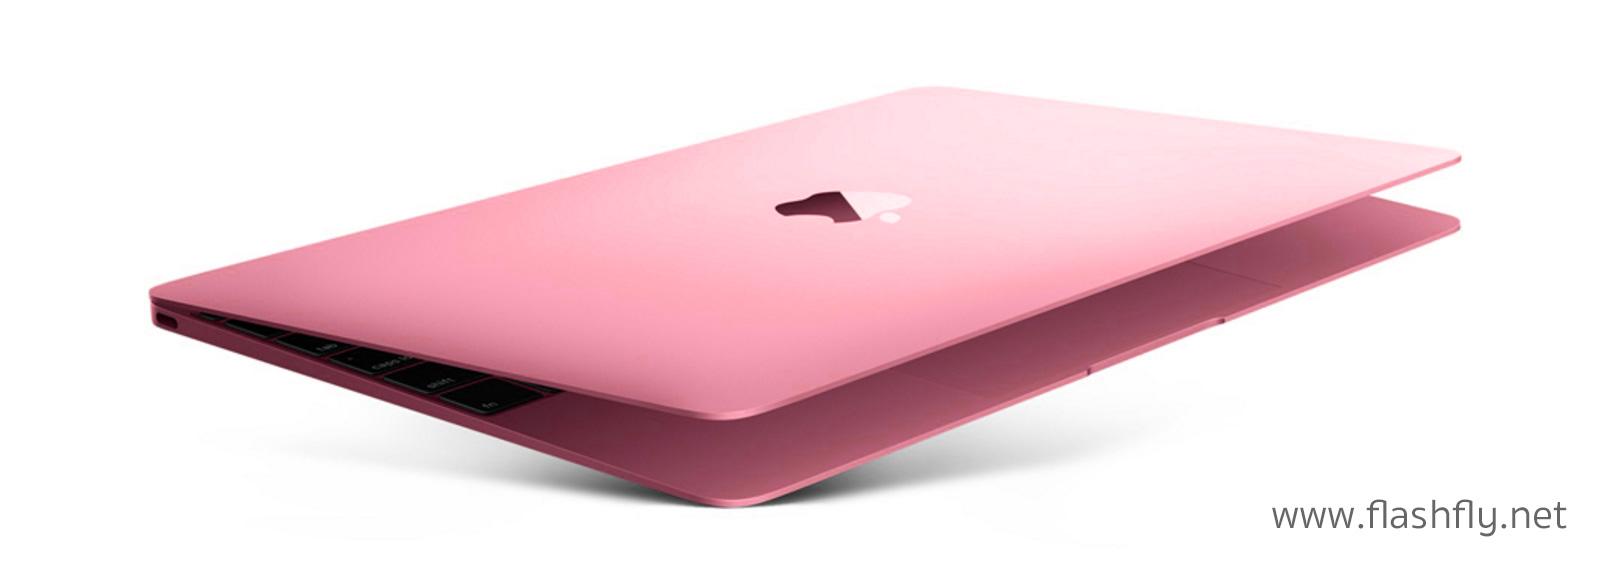 mac-book-rose-gold-flashfly